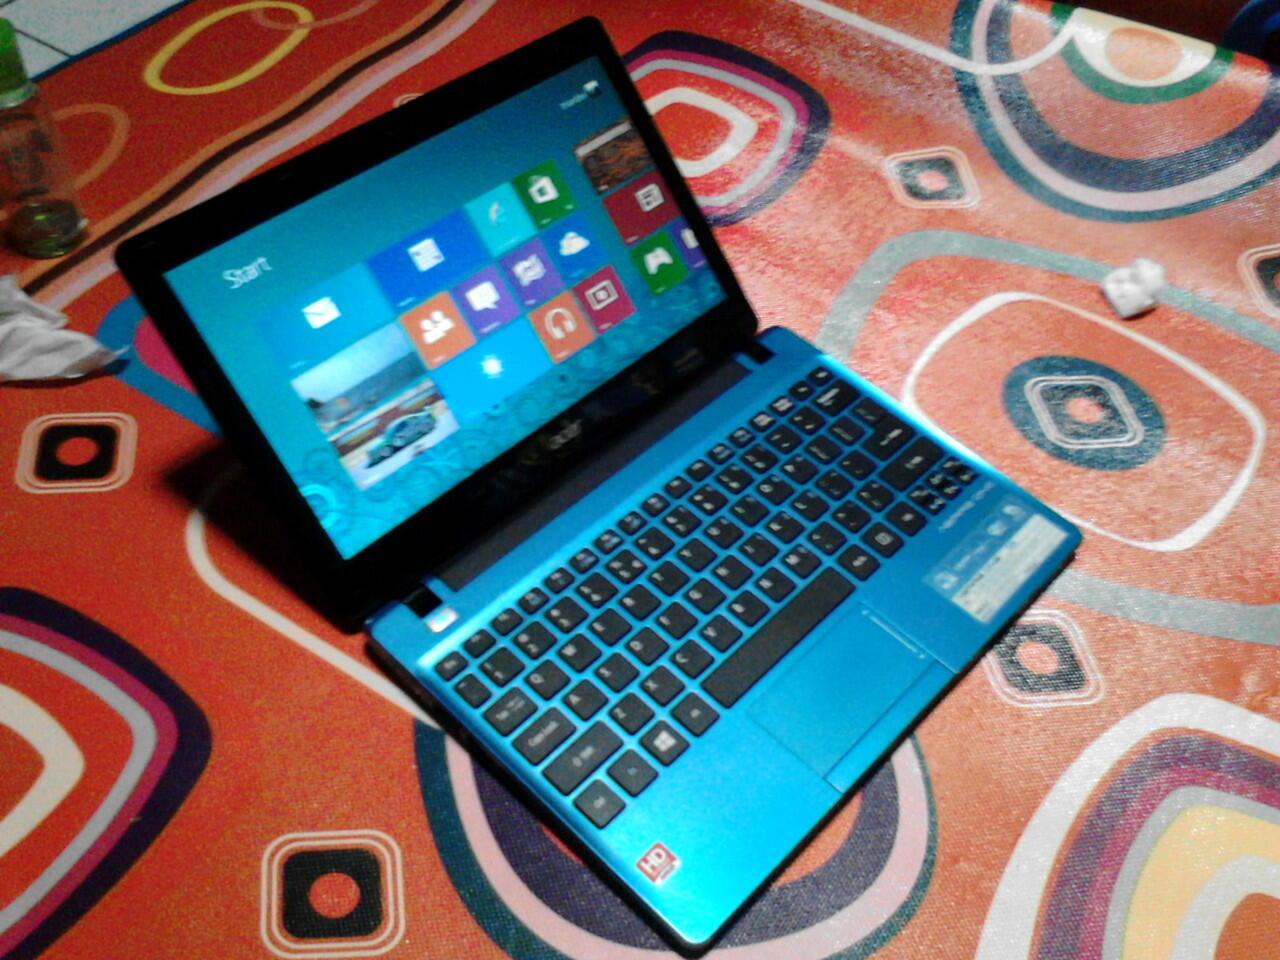 Netbook Acer Aspire One 725 (Bandung)